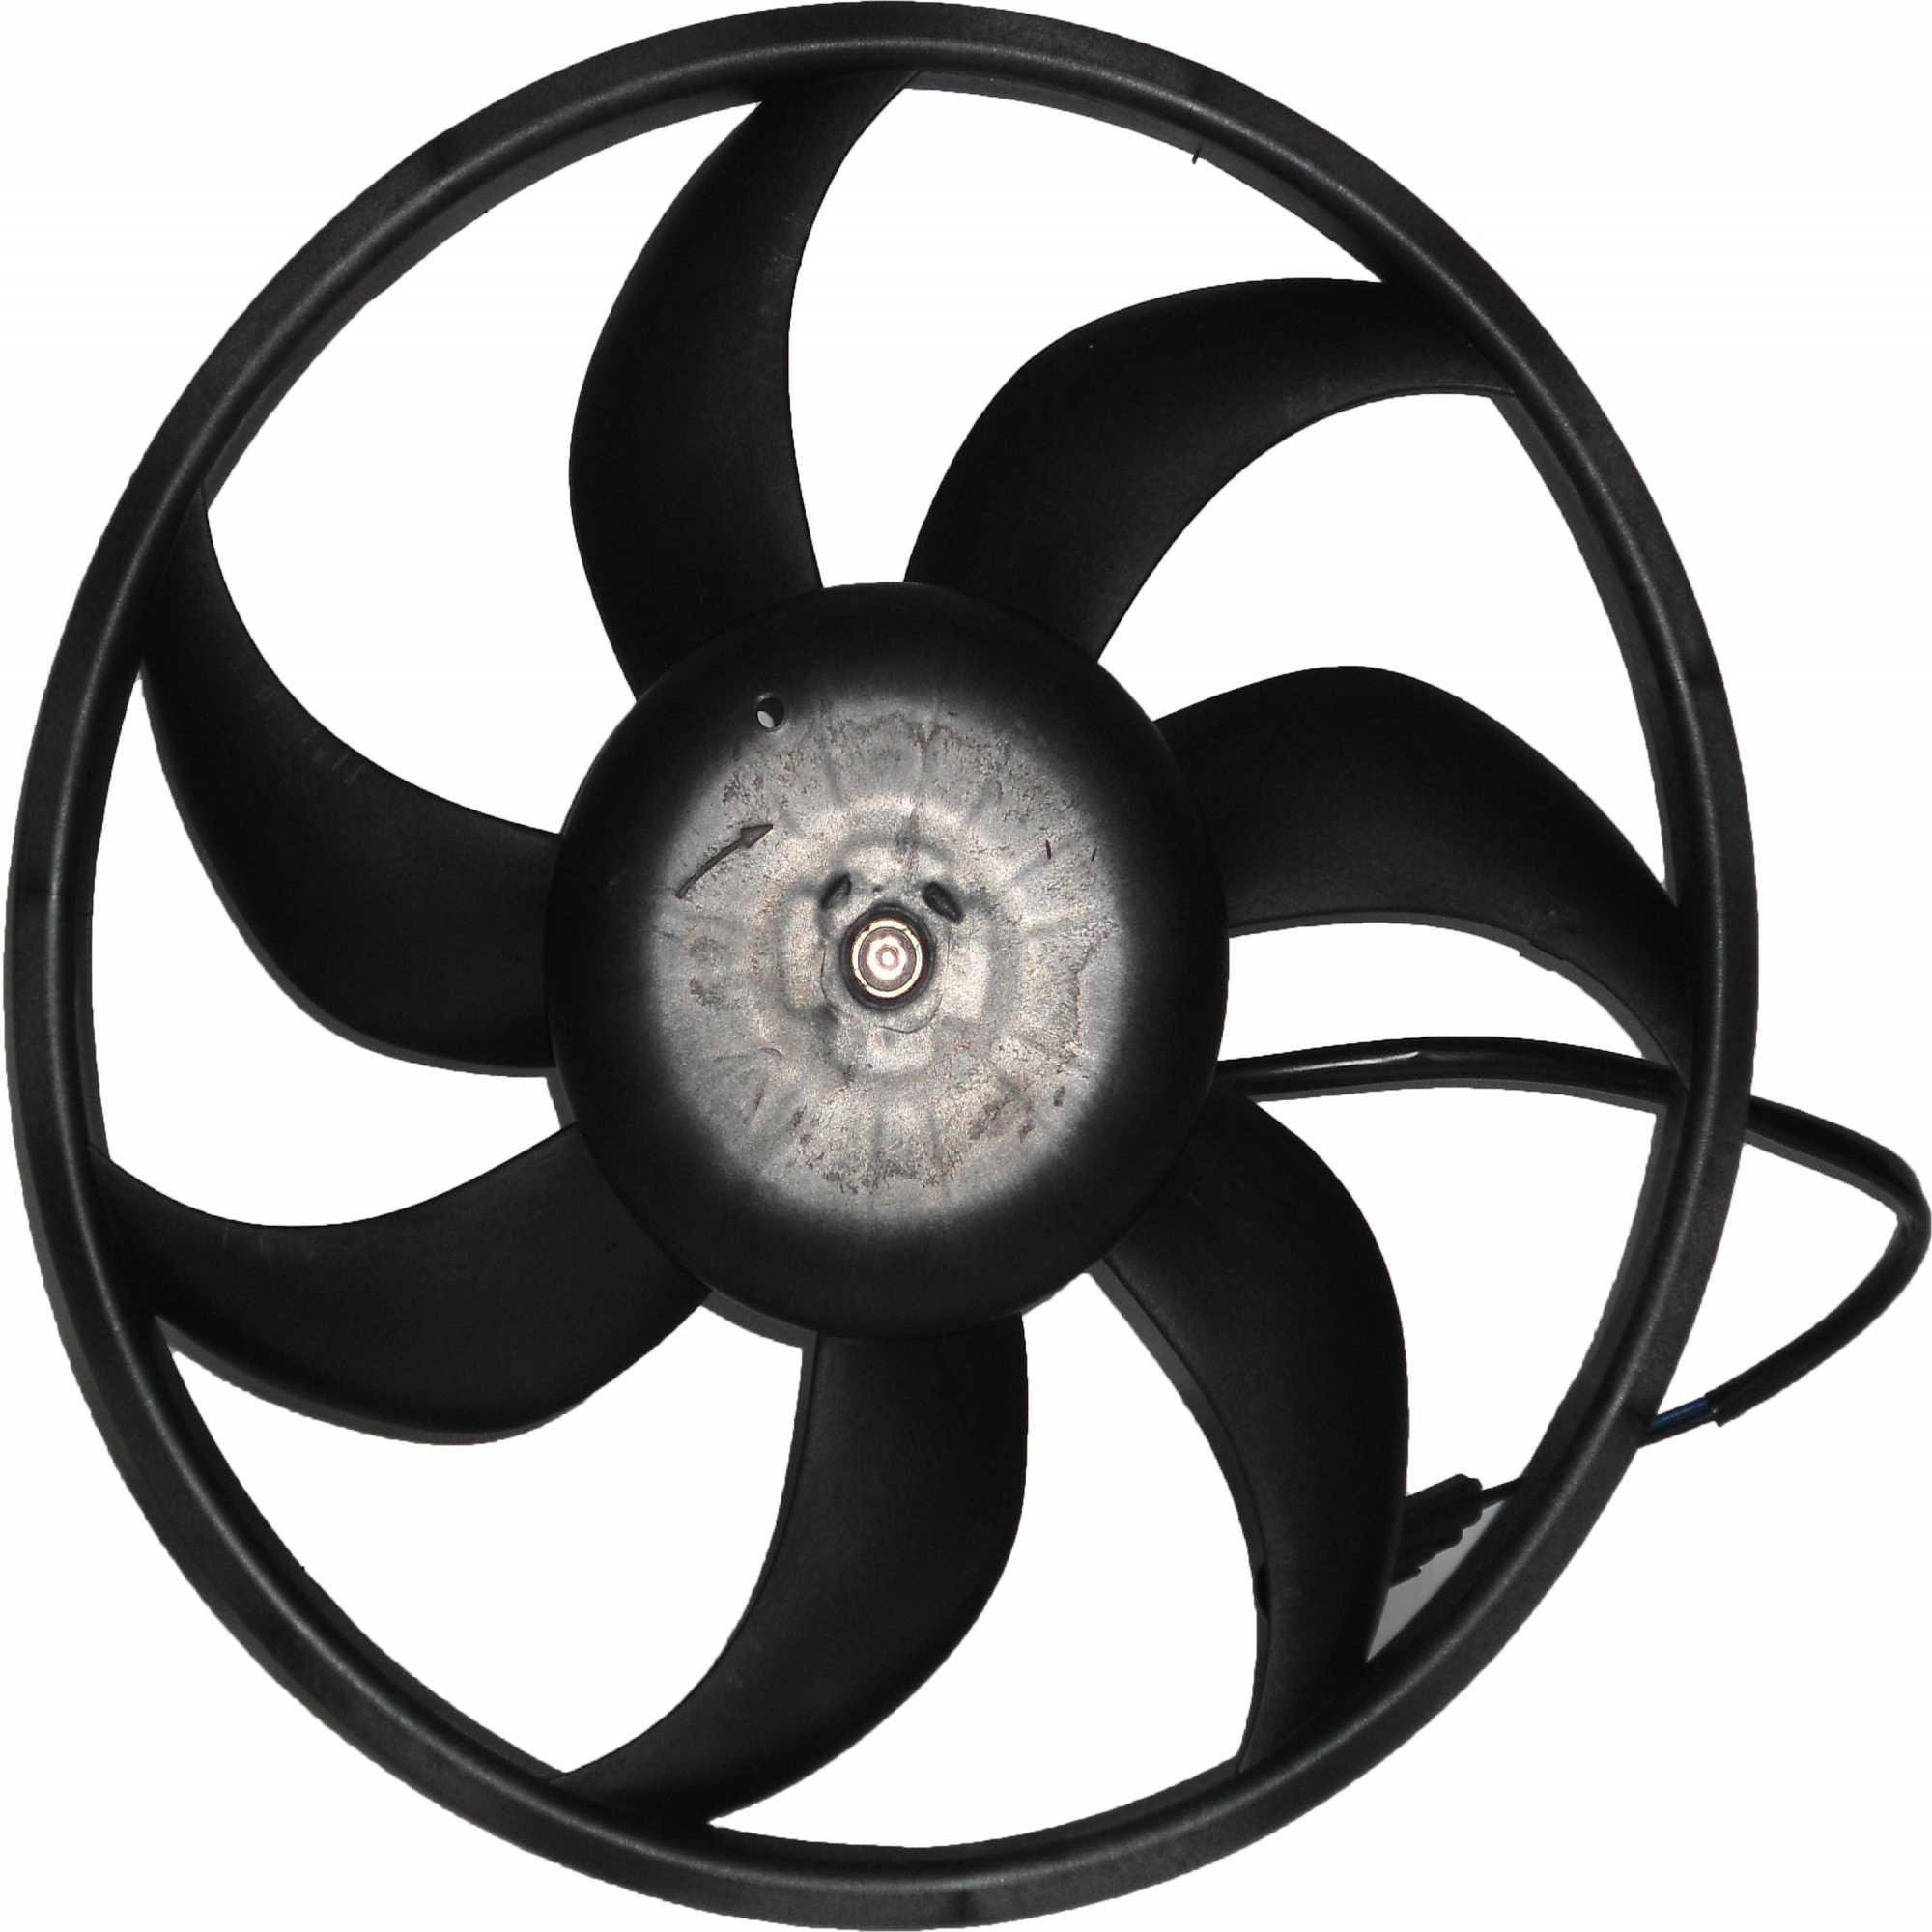 Eletroventilador Idea Palio Strada Corsa Montana 2001 A 2017 C/Ar